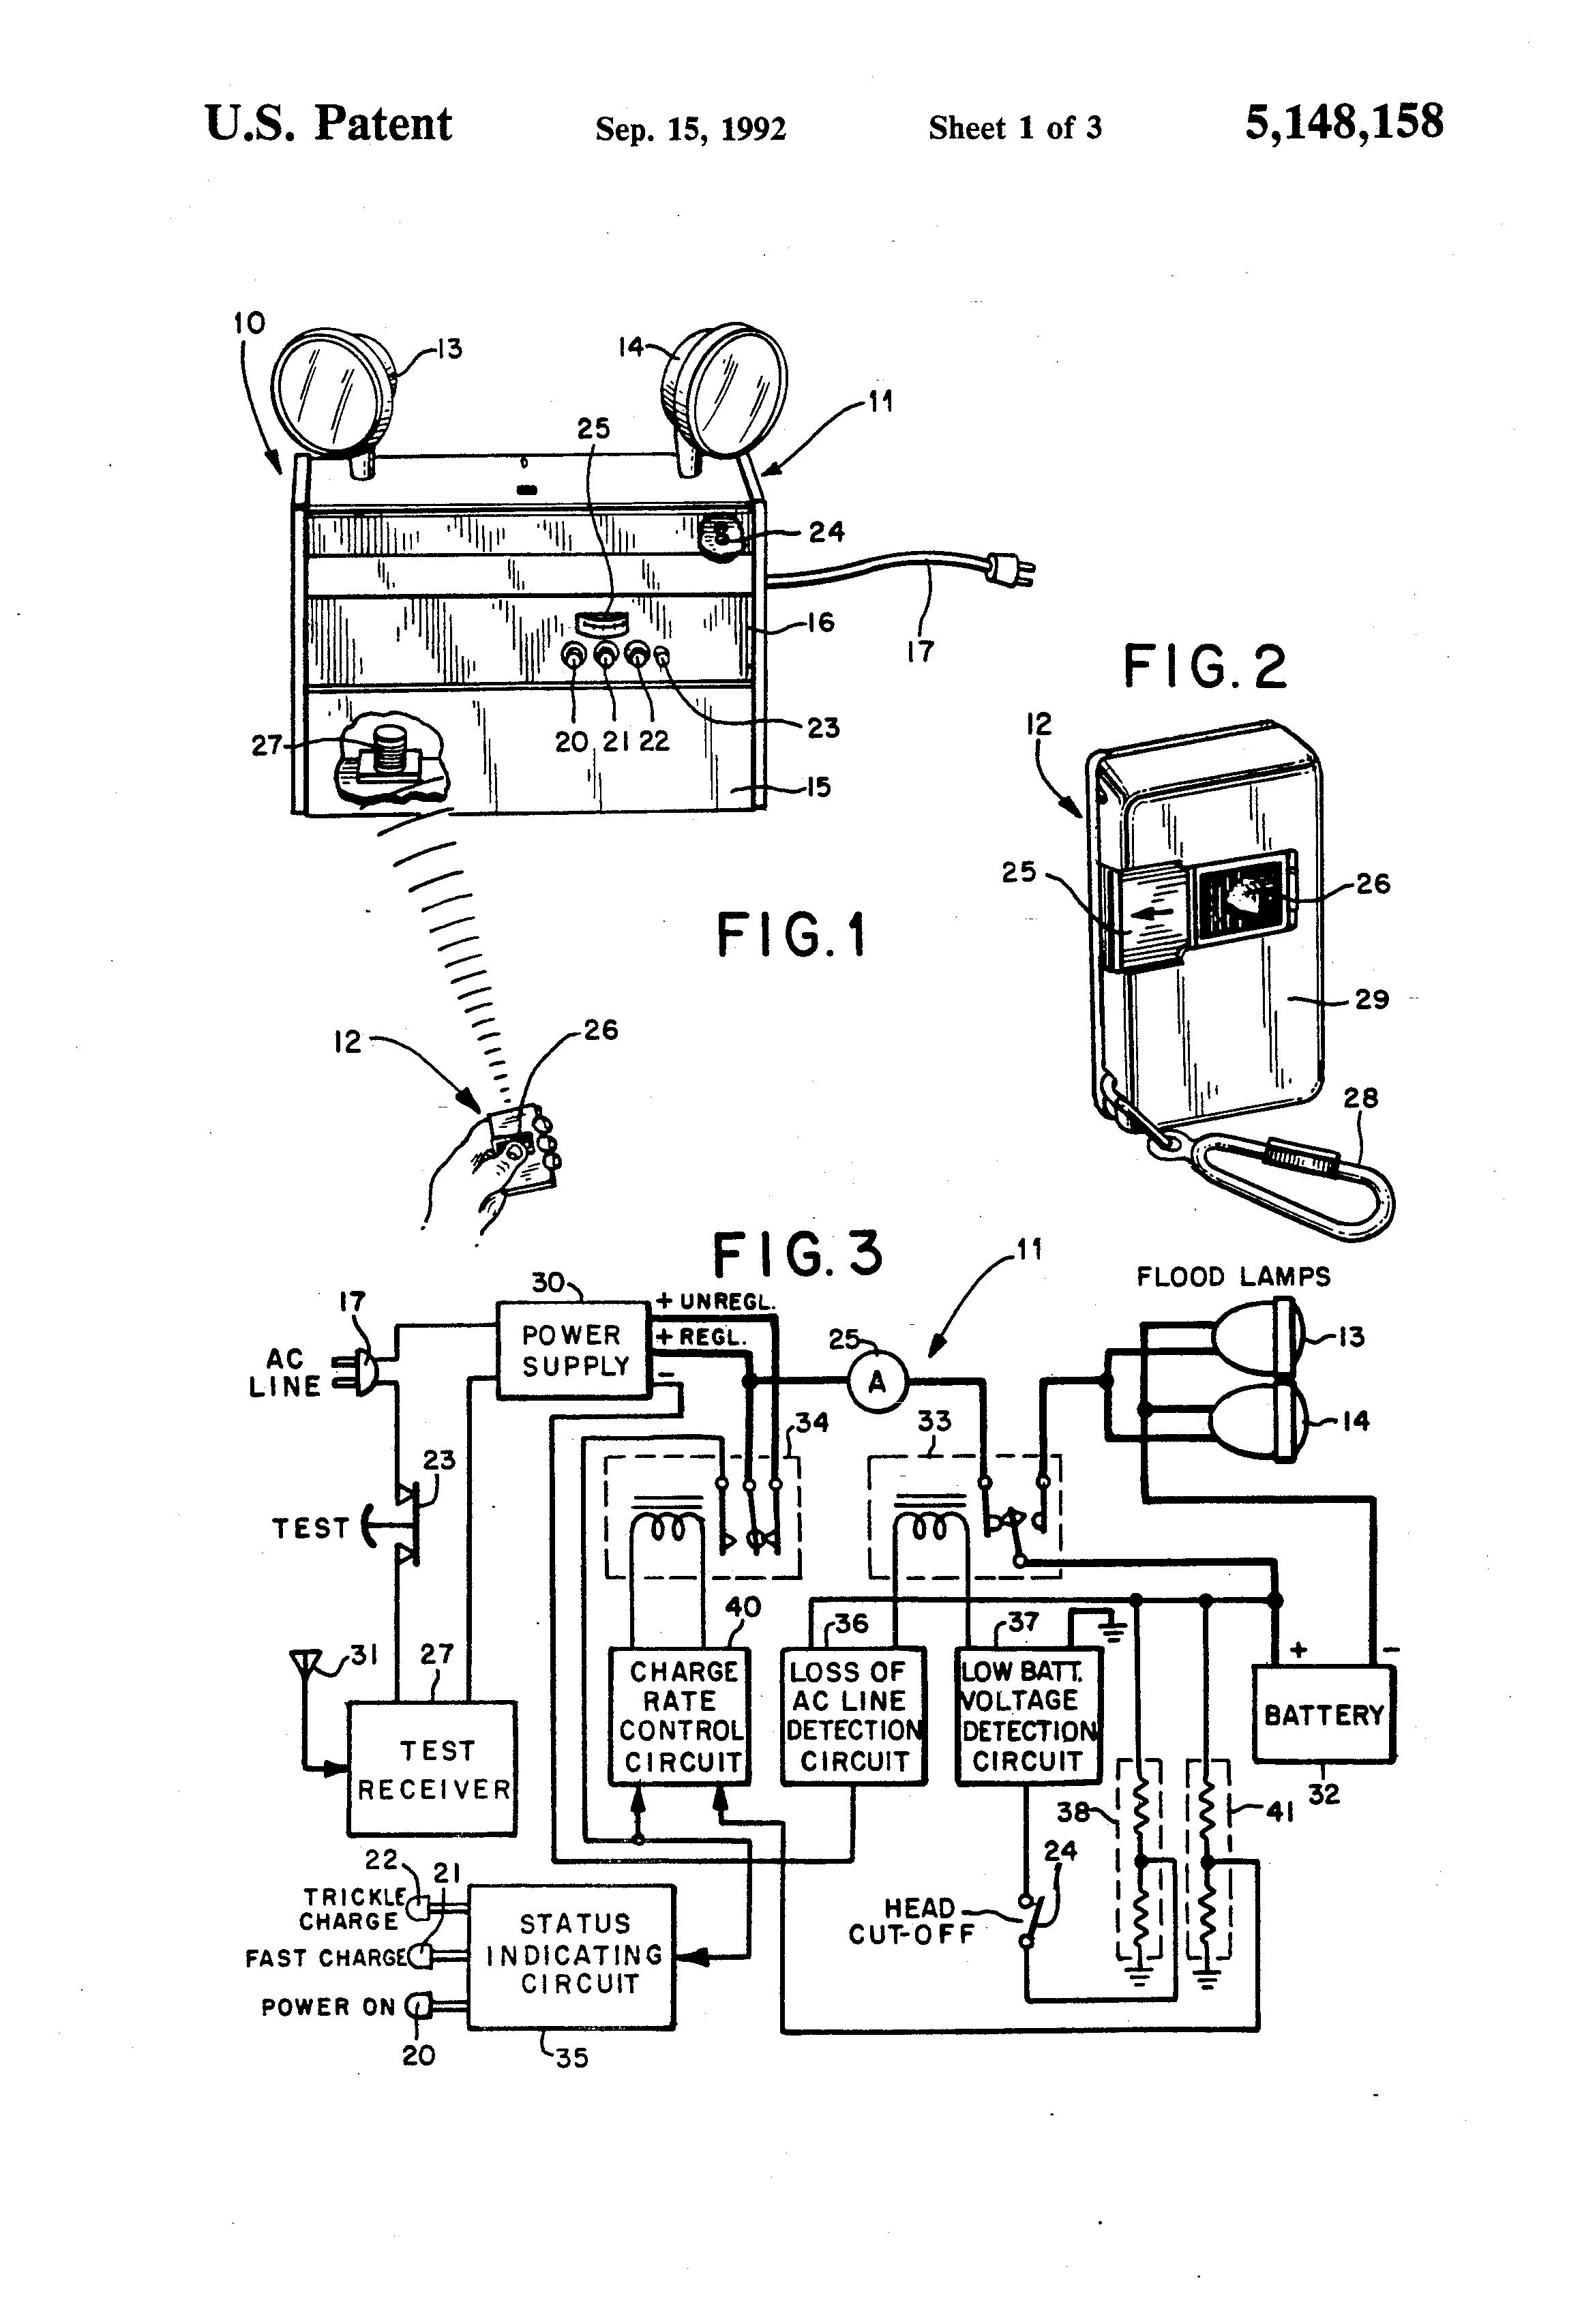 iota i 48 emergency ballast wiring diagram